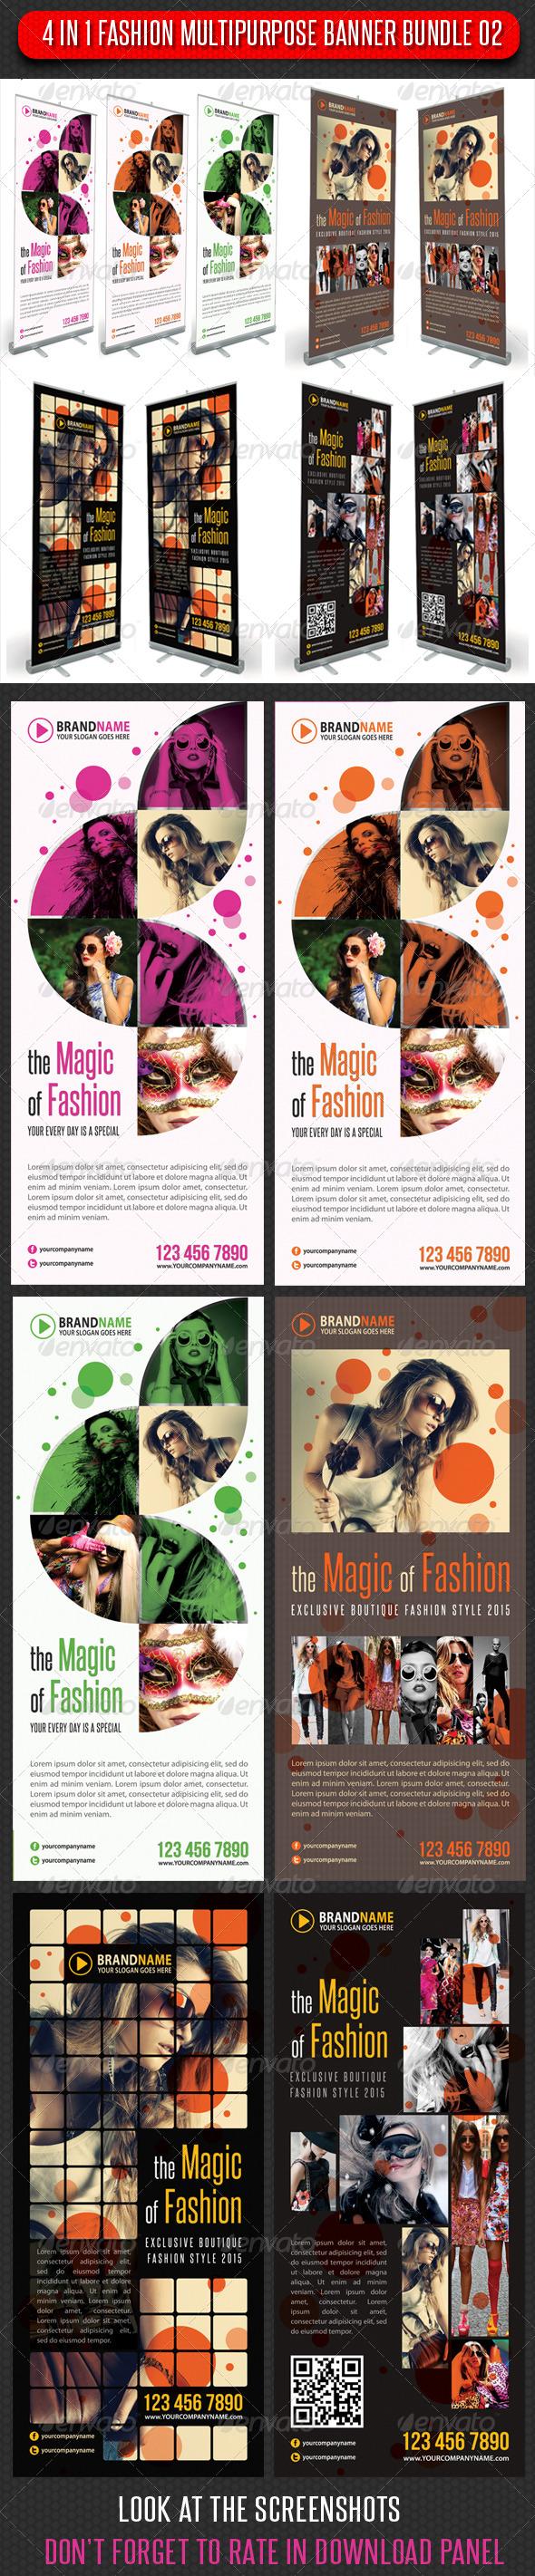 4 in 1 Fashion Multipurpose Banner Bundle 02 - Signage Print Templates